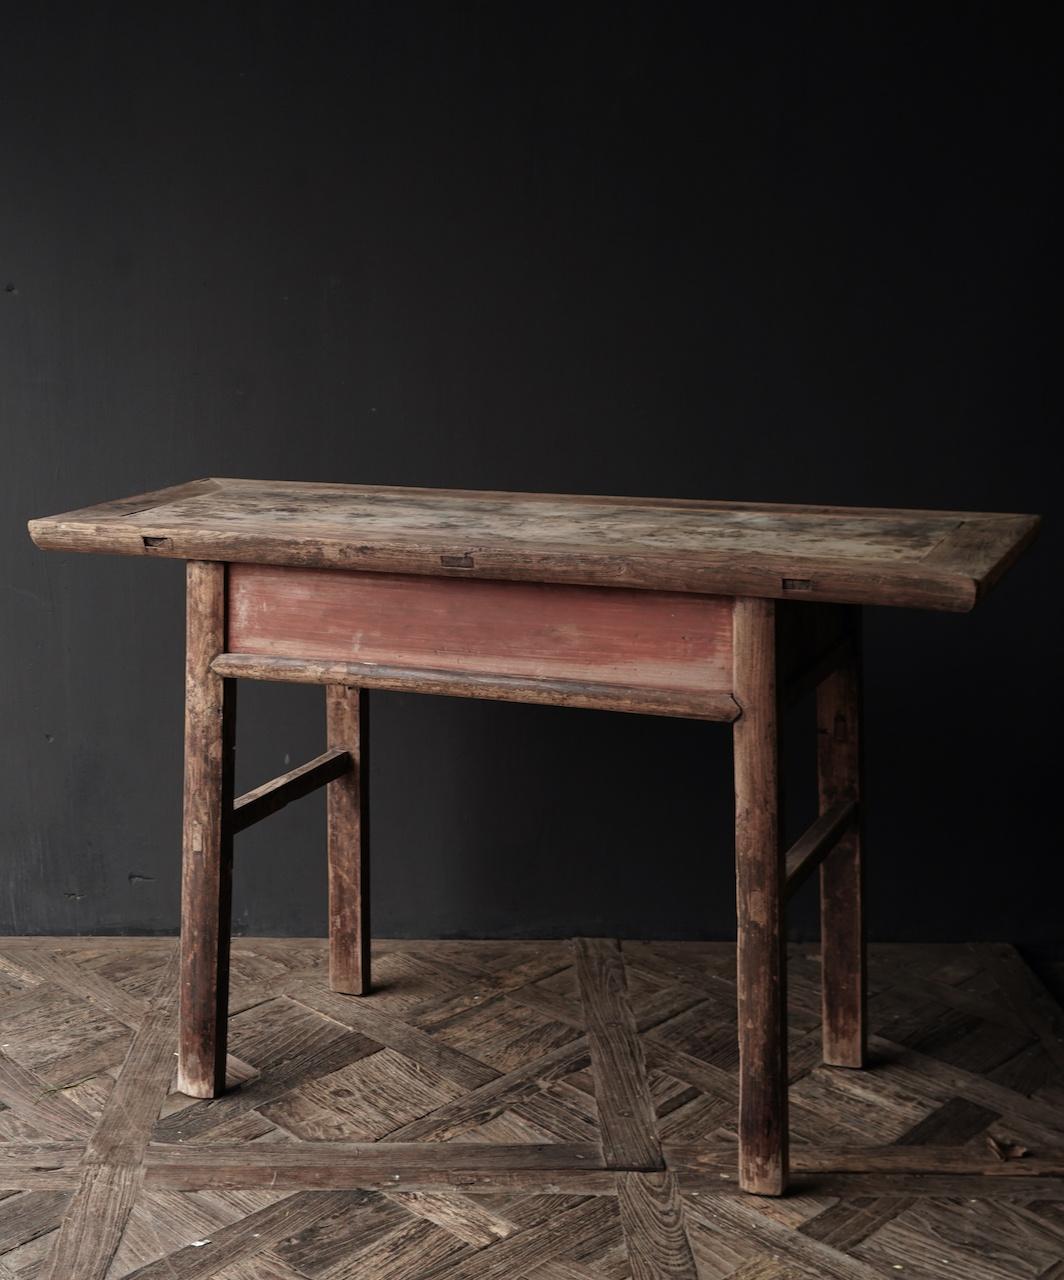 Authentieke Sidetable oftewel muurtafel met een lade-6